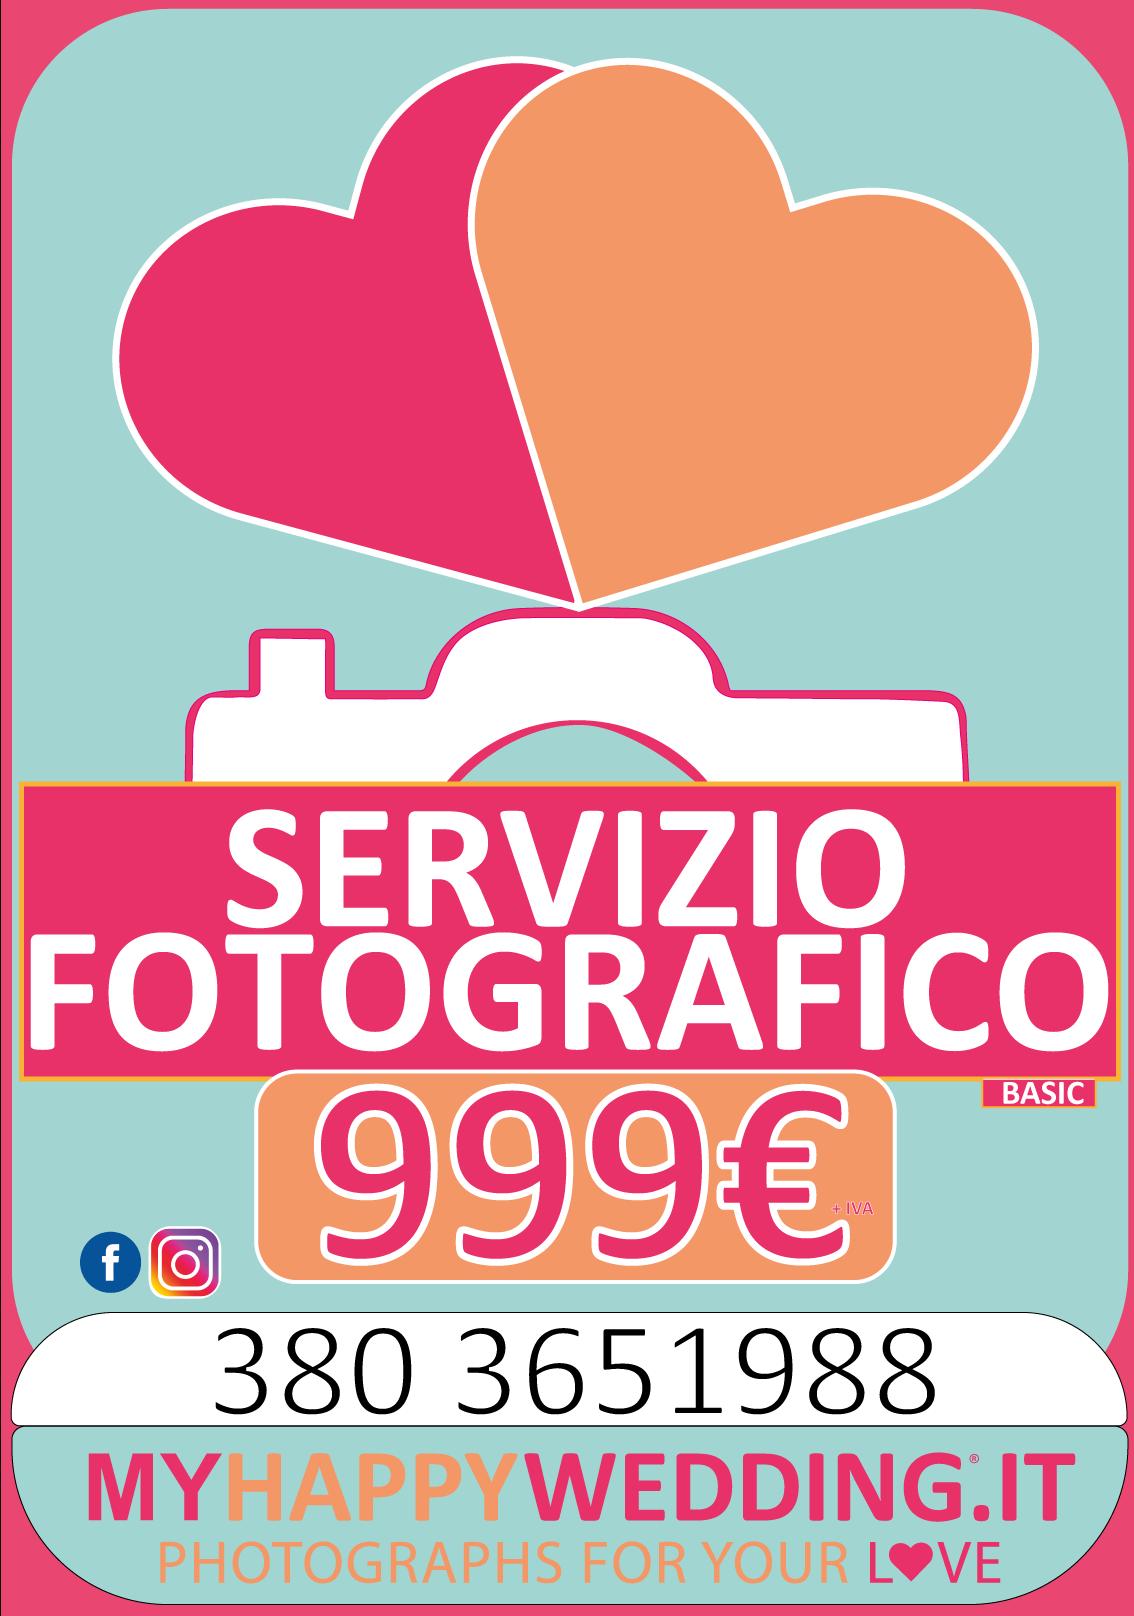 saldi matrimonio offerta foto matrimonio 999€